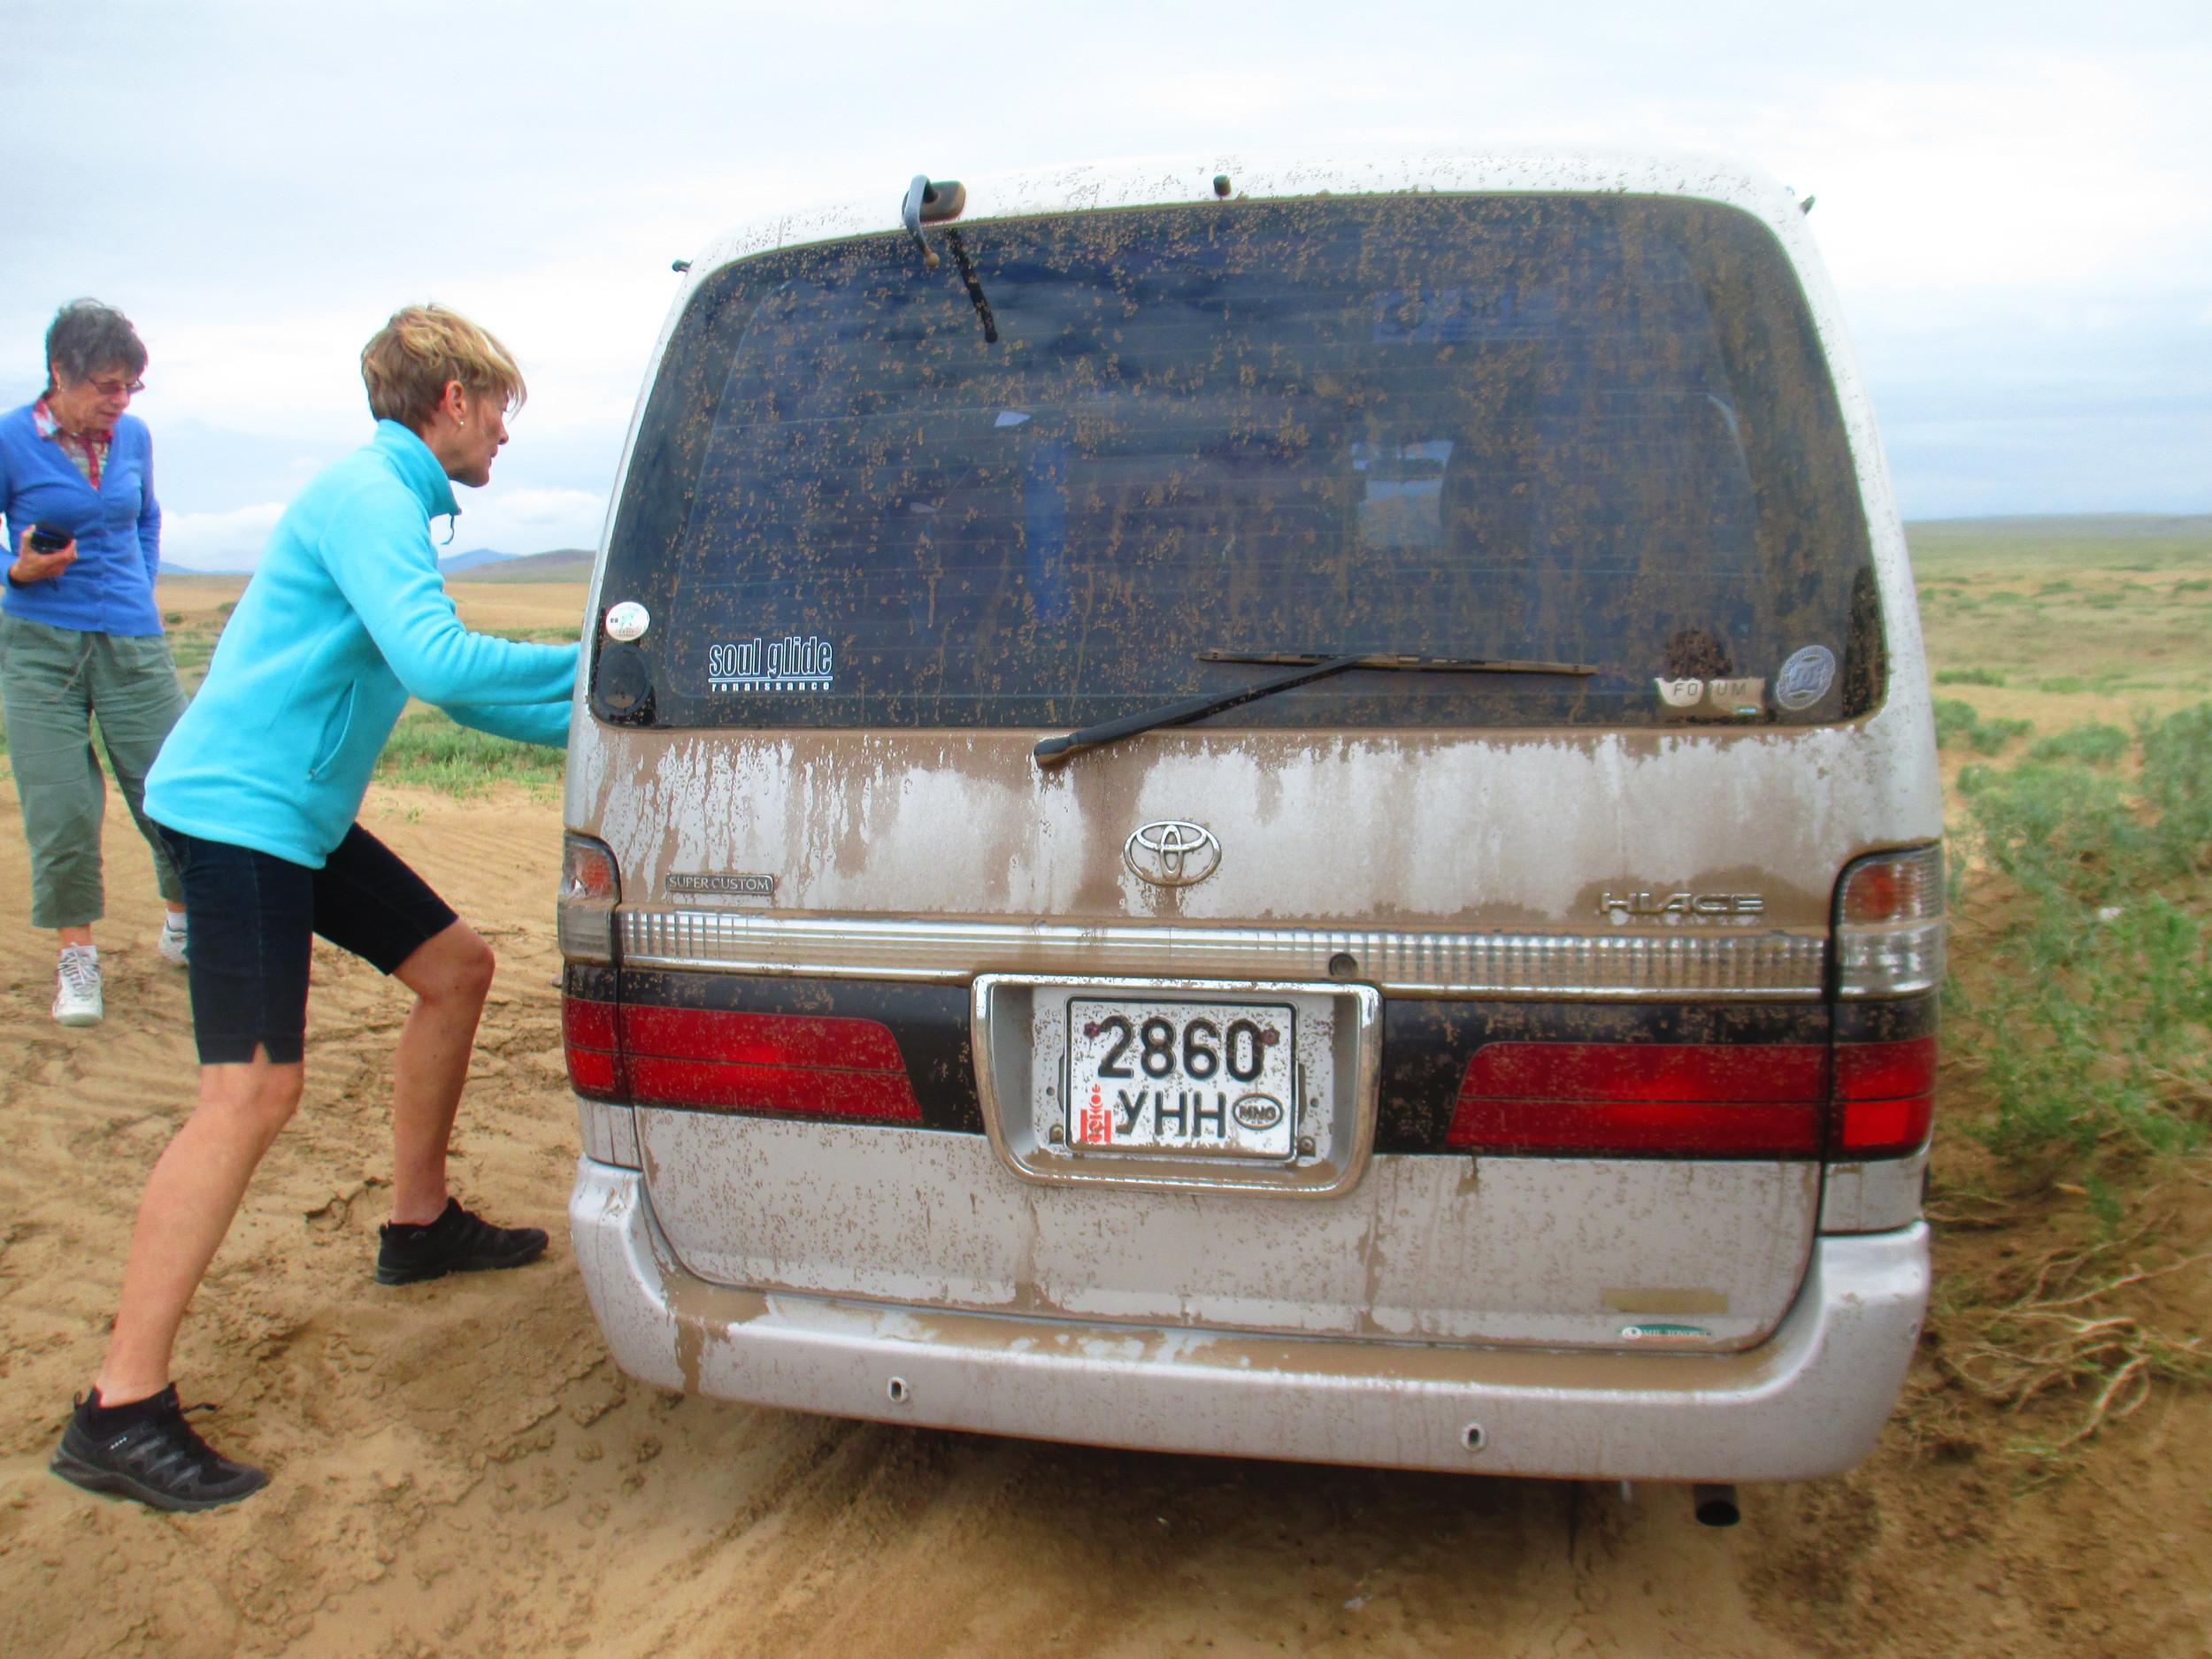 Van bogged, Sari to the rescue